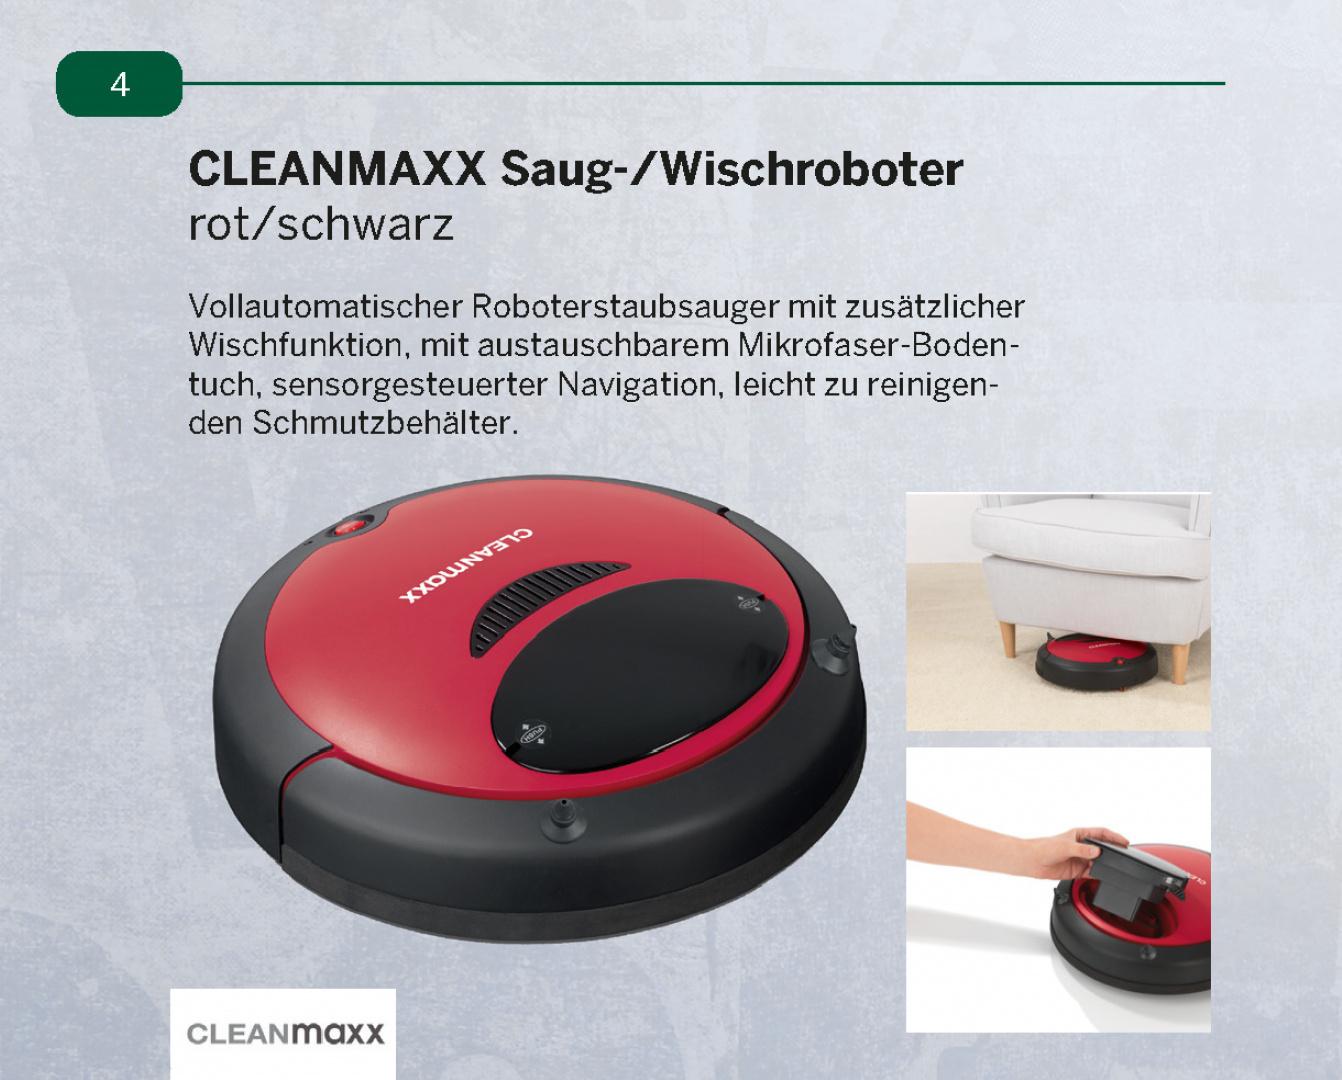 LwL_Prämien 4 Cleanmaxx